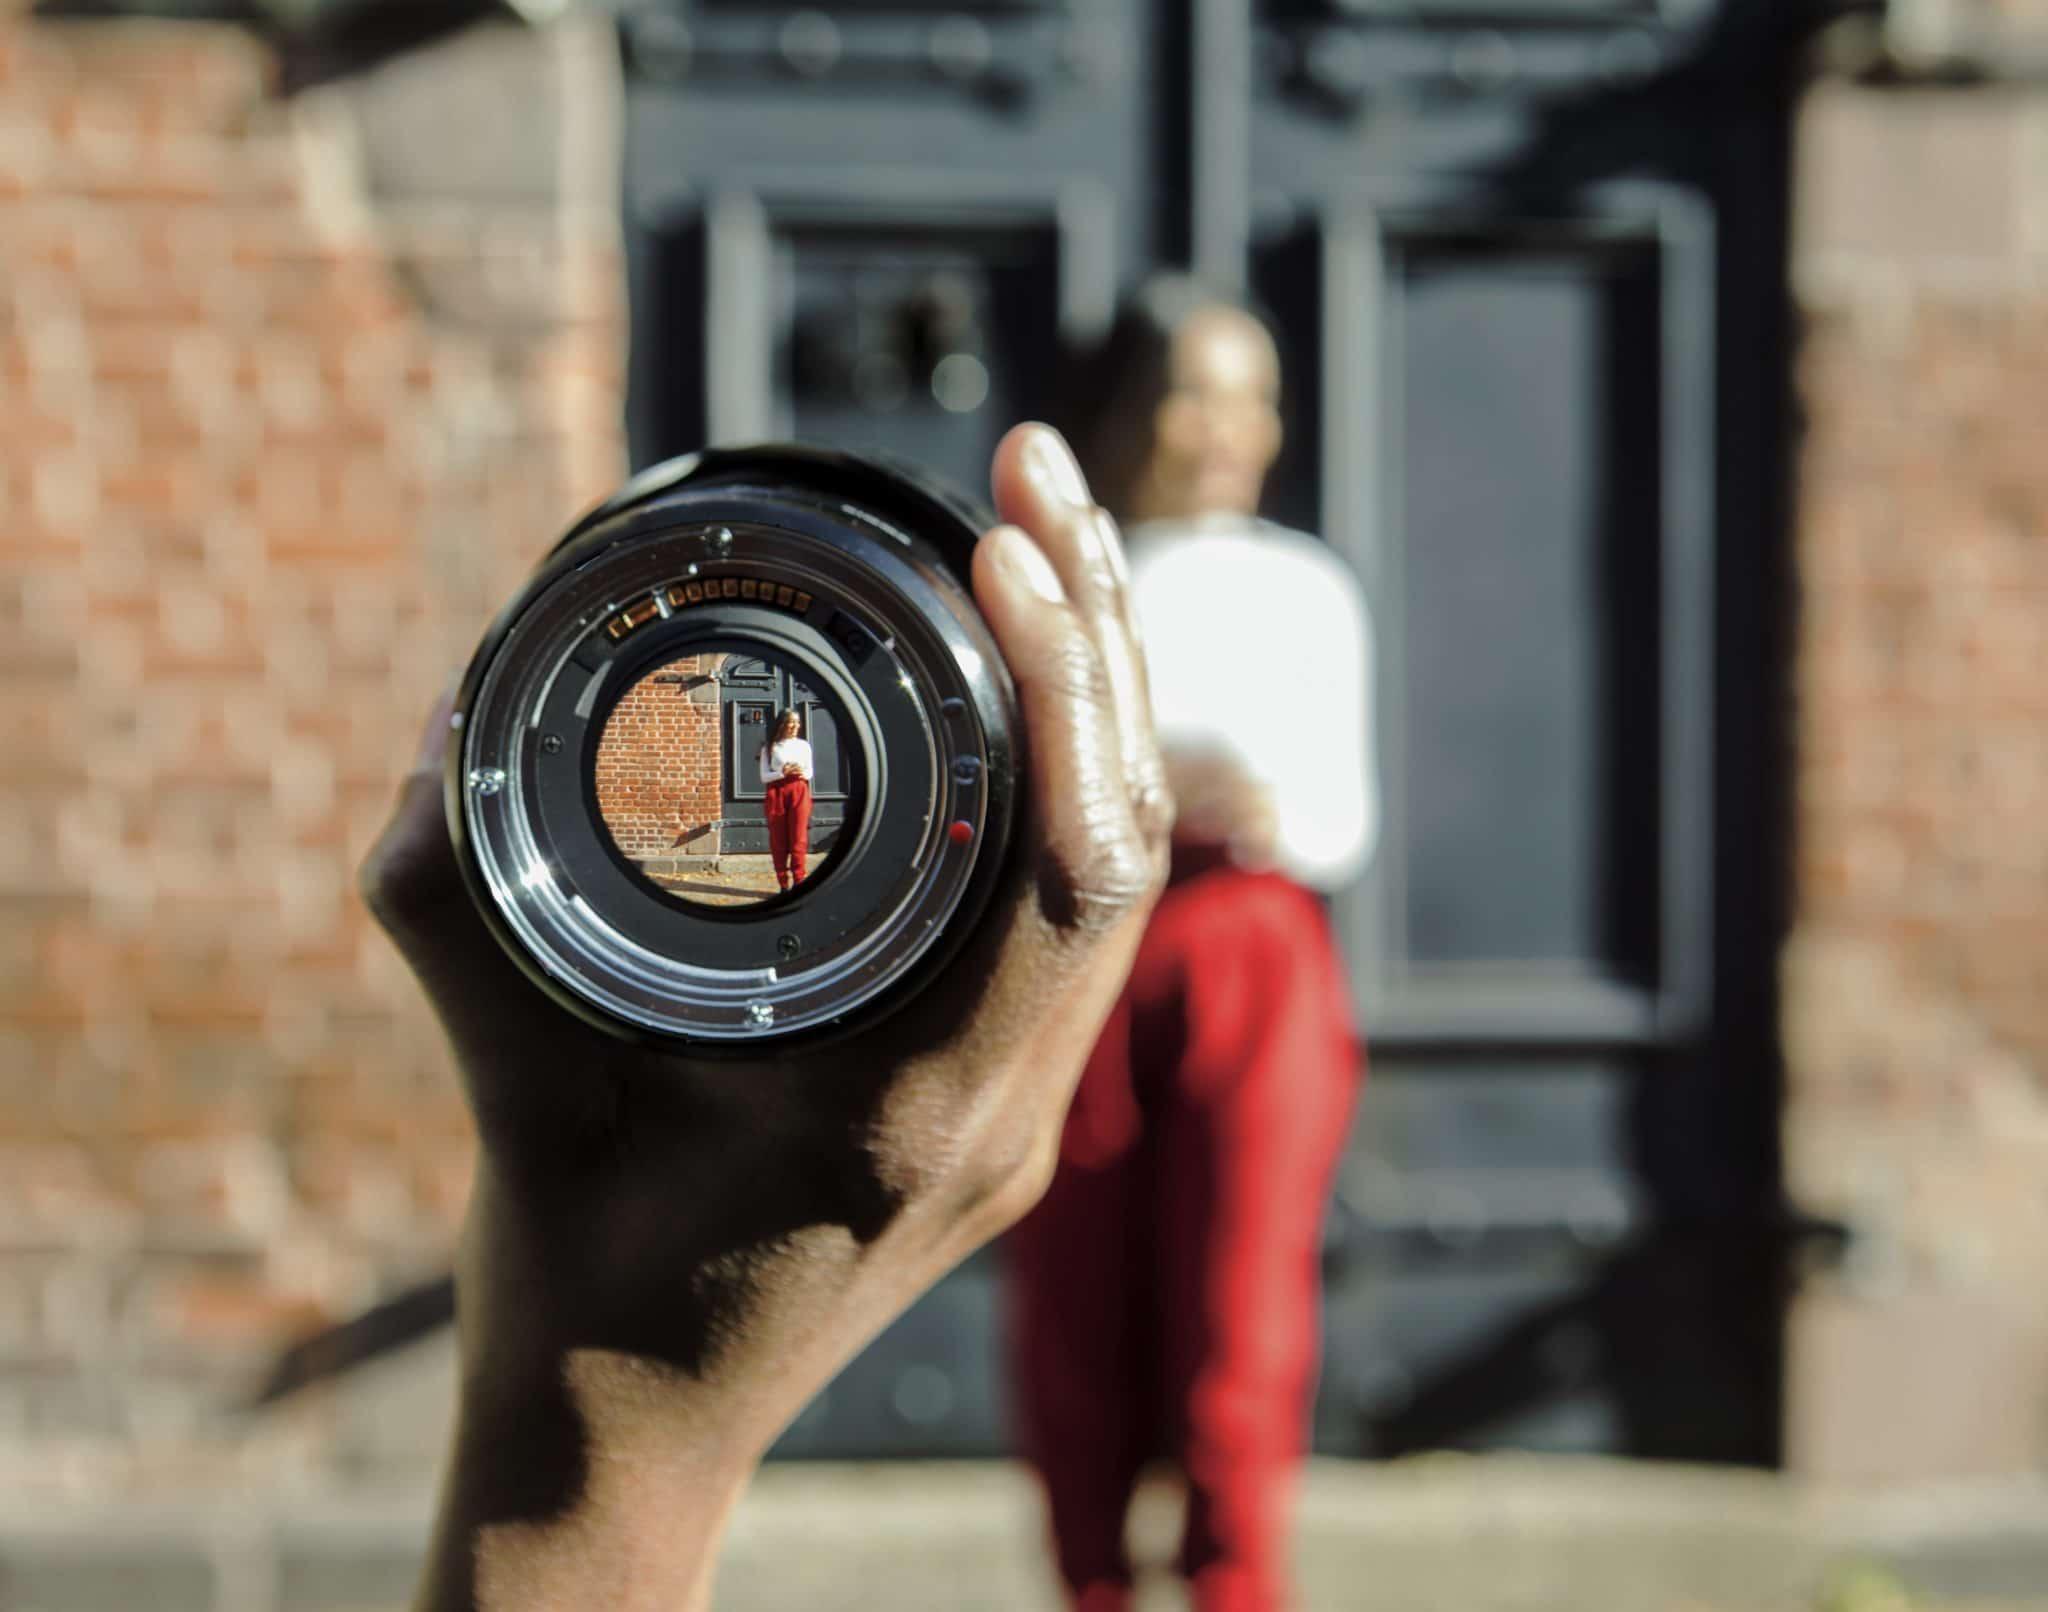 Focus in the lens photo